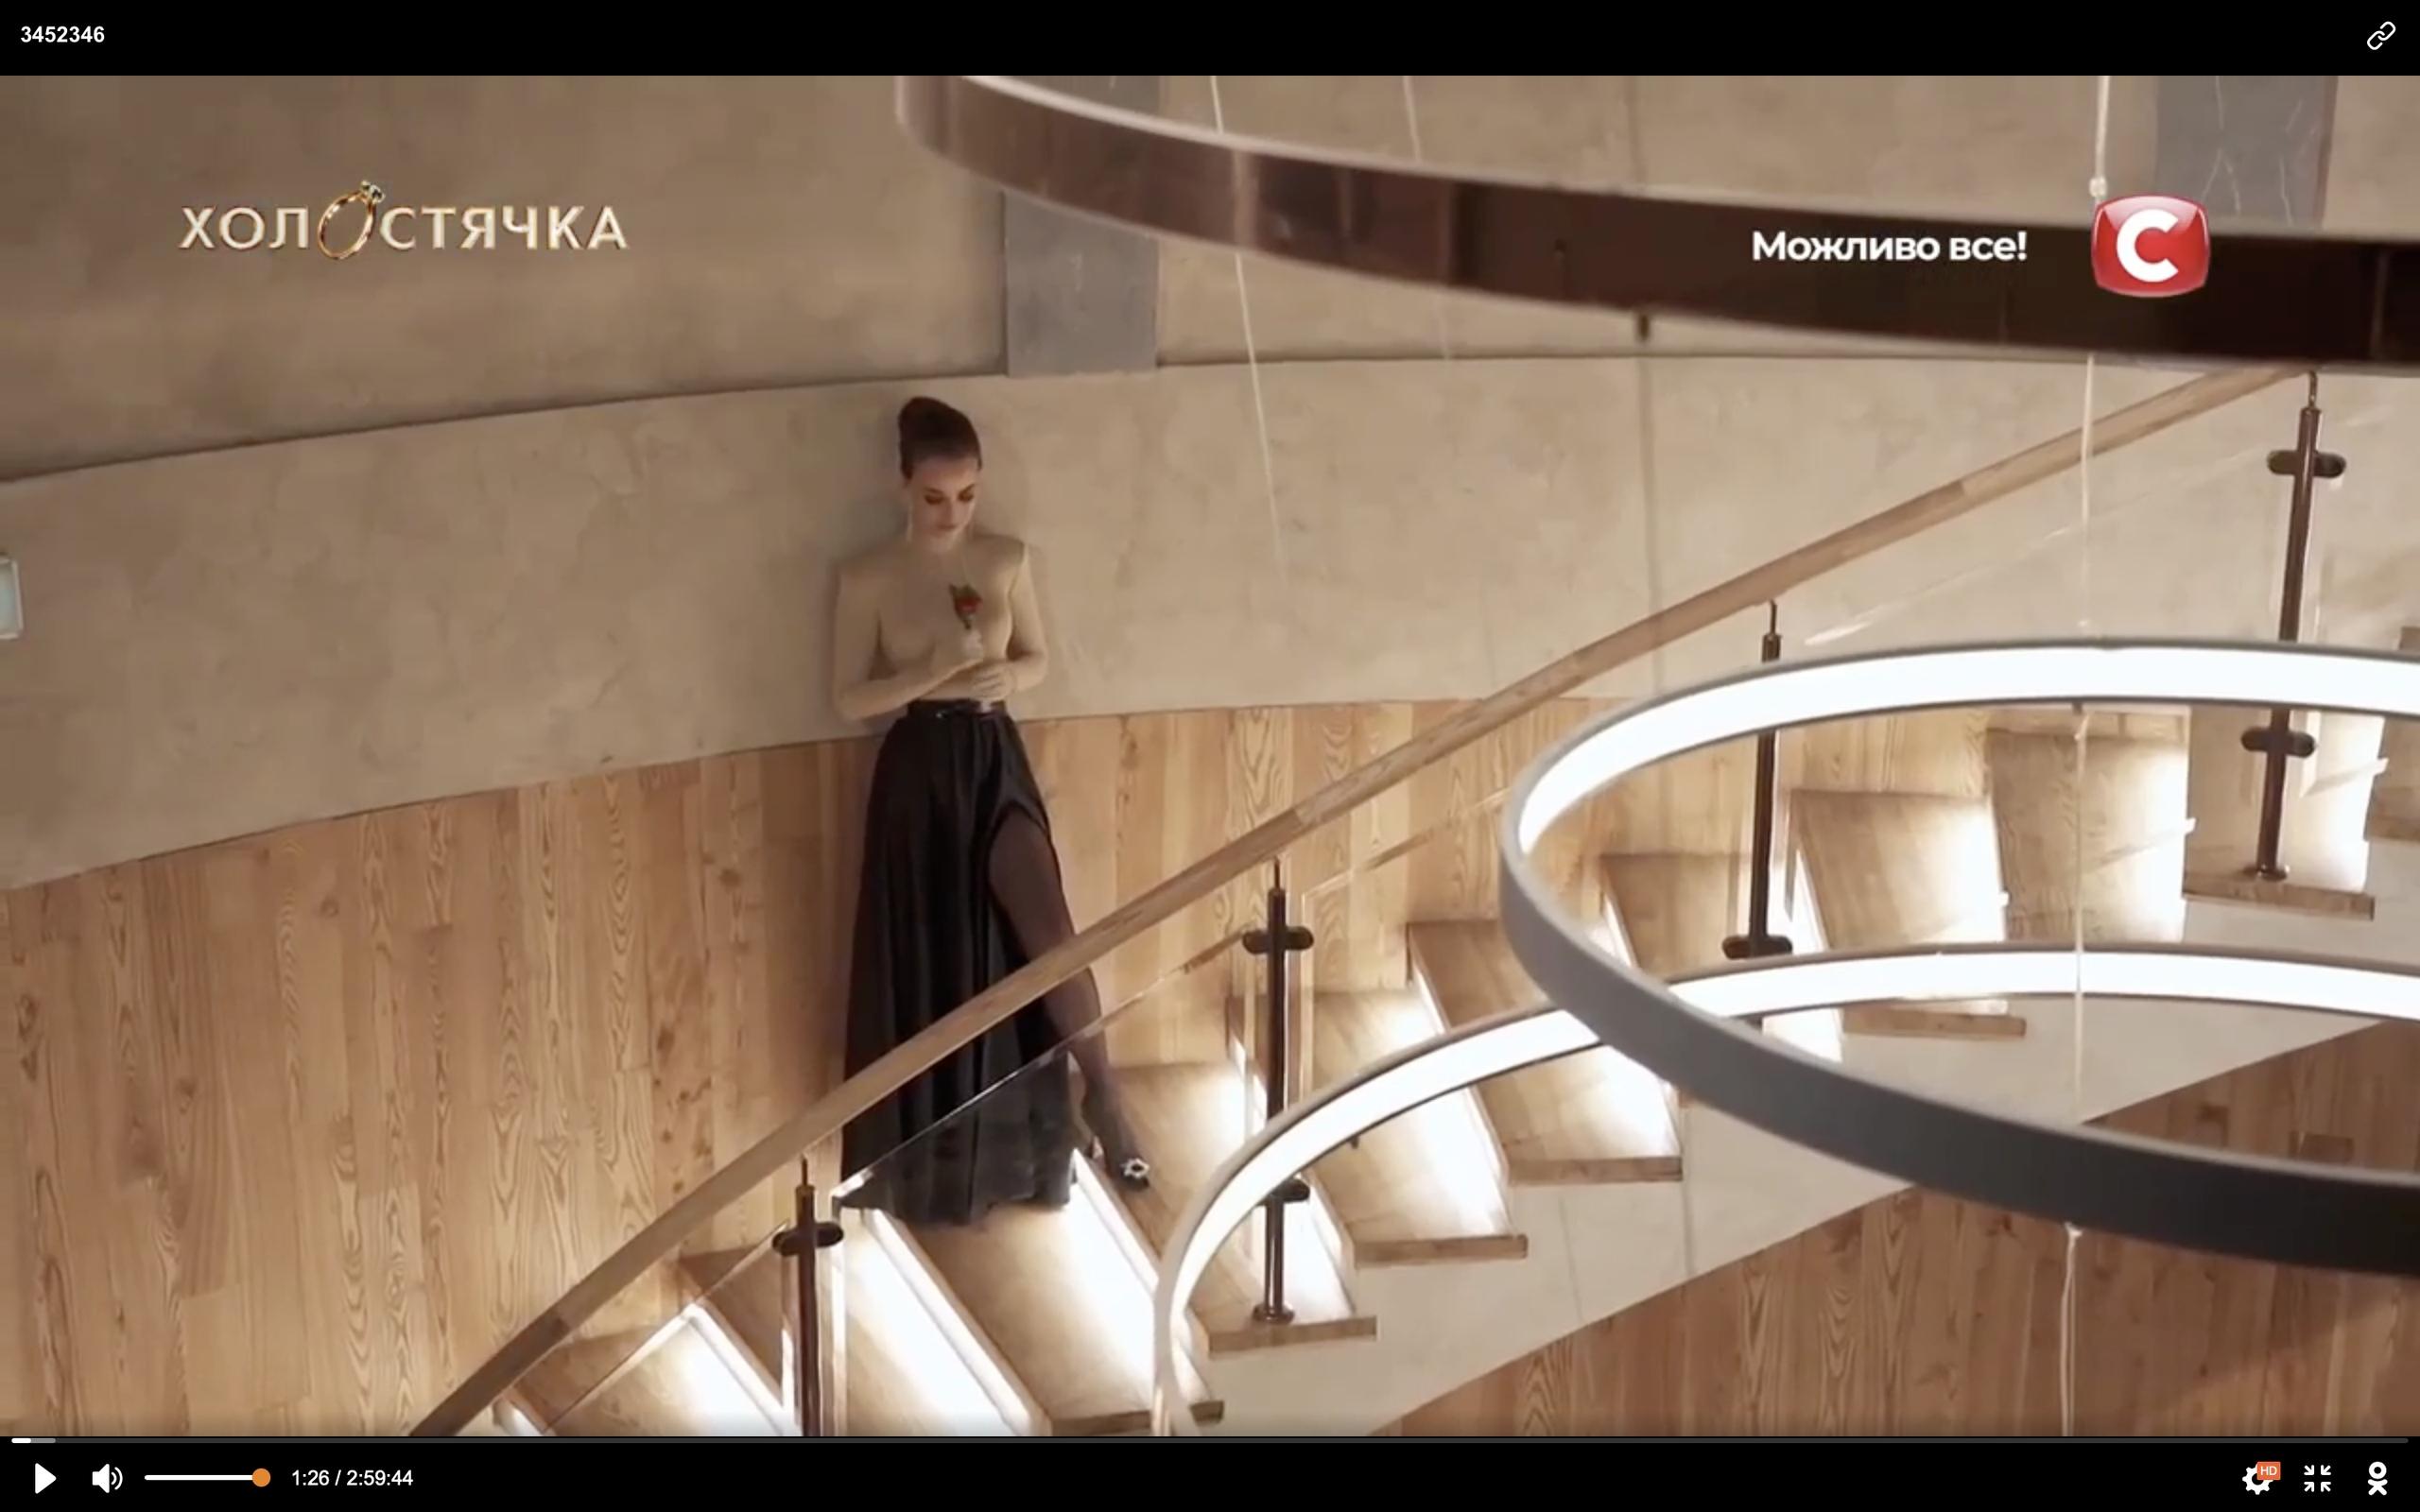 Bachelorette Ukraine - Season 1 - Ksenia Mishina - Episode Discussion - *Sleuthing Spoilers* - Page 11 RtbeLfjfHwU